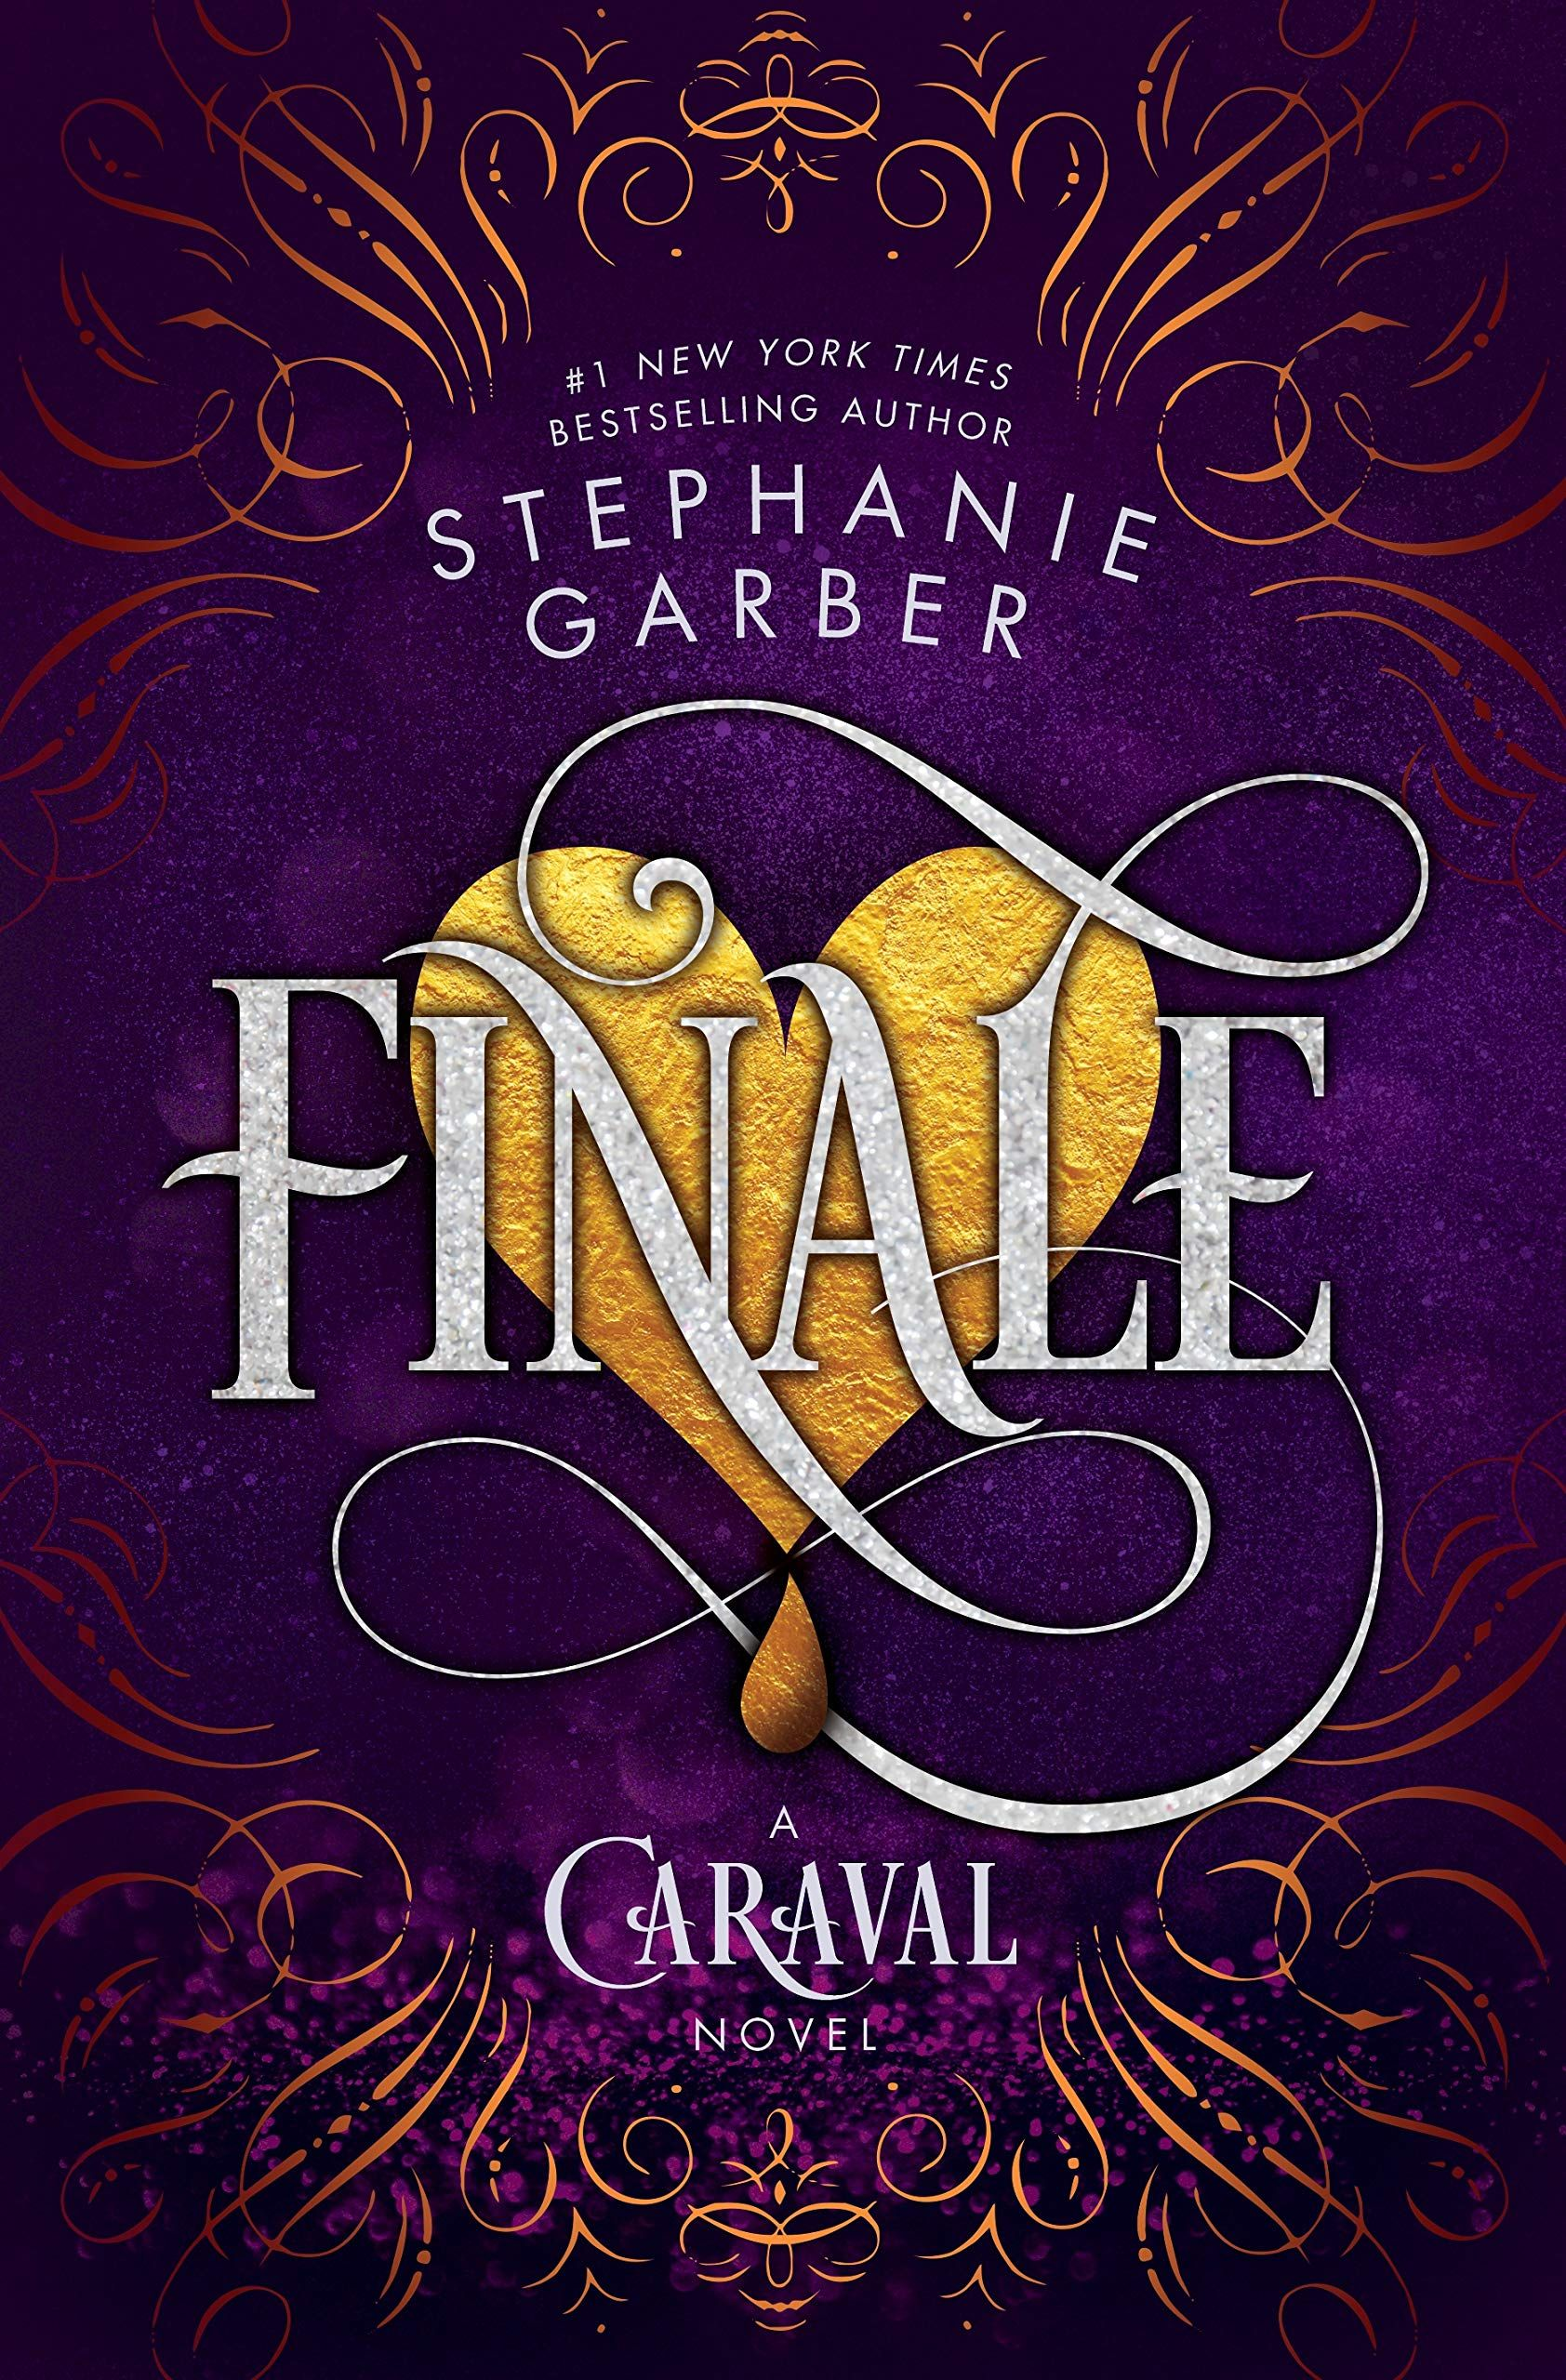 Pdf Finale Caraval 3 By Stephanie Garber Ya Fantasy Books